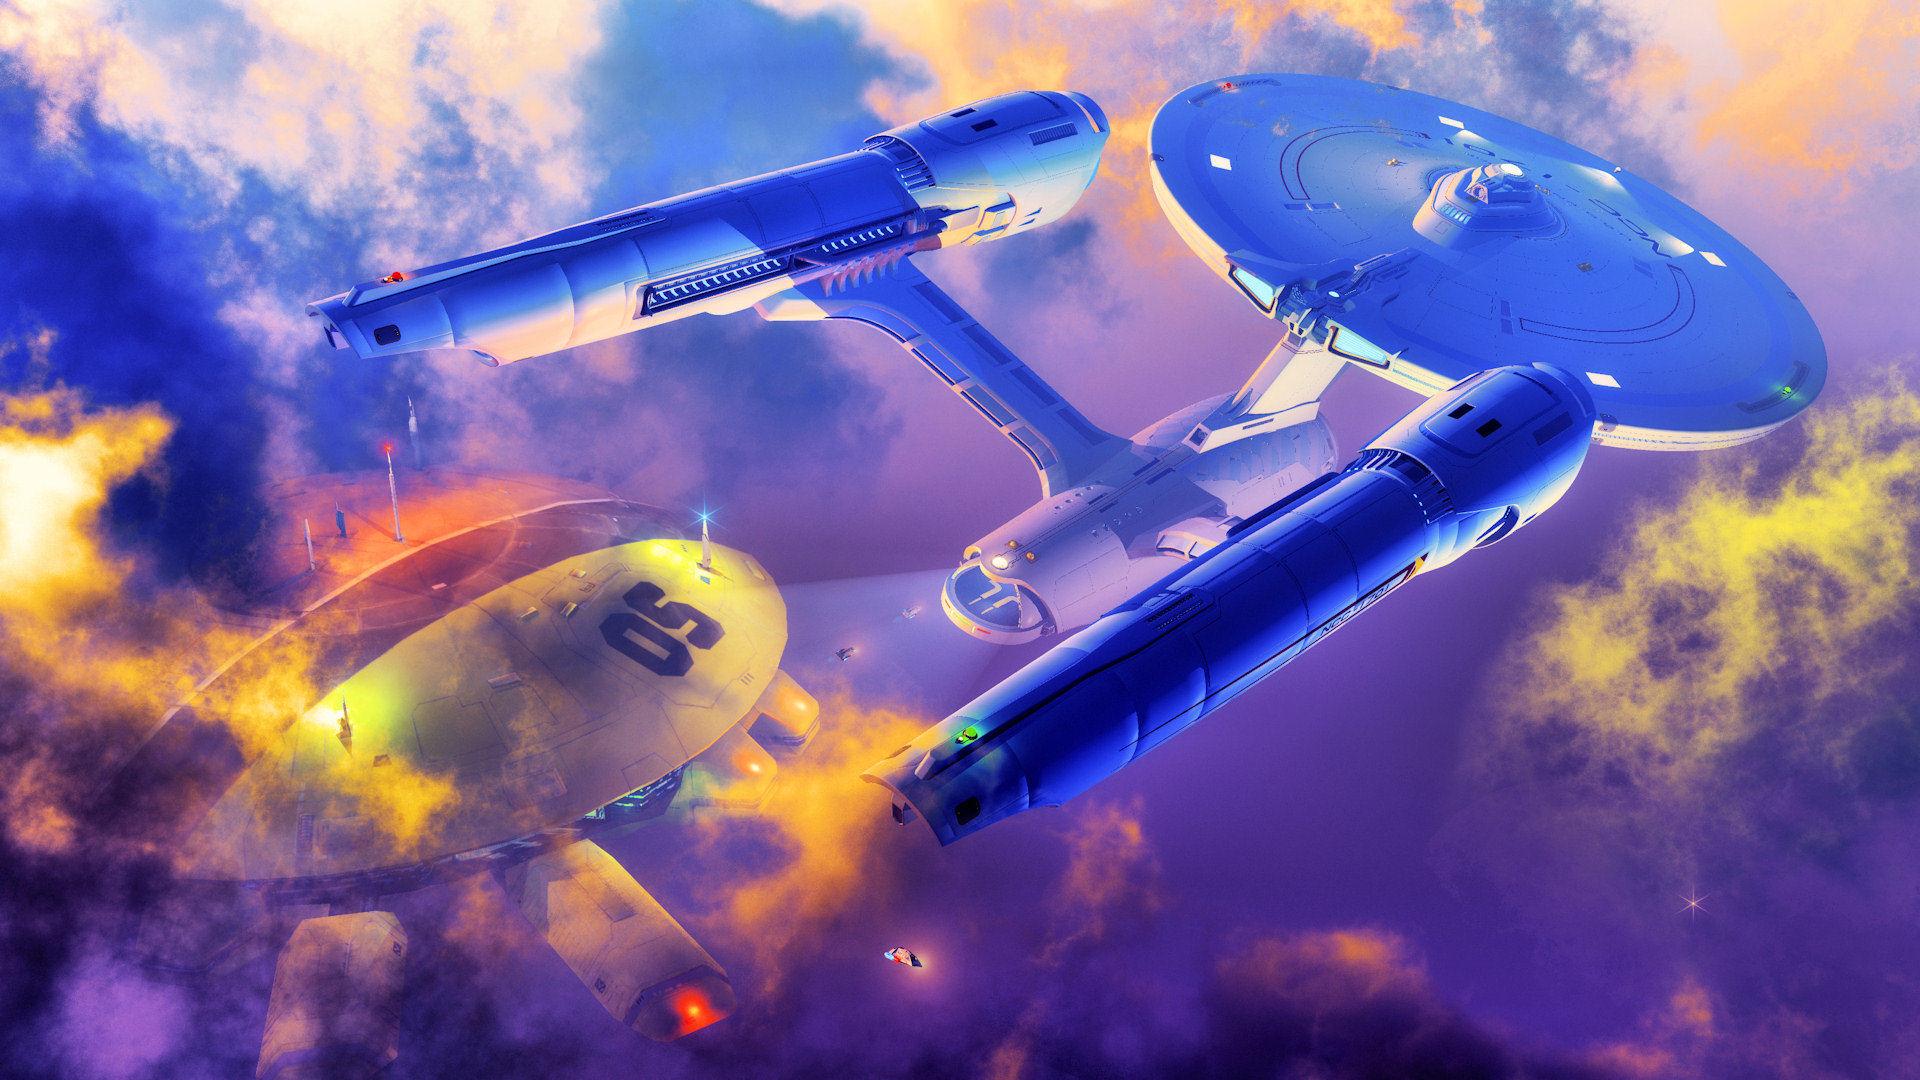 General 1920x1080 Star Trek USS Enterprise (spaceship) artwork science fiction